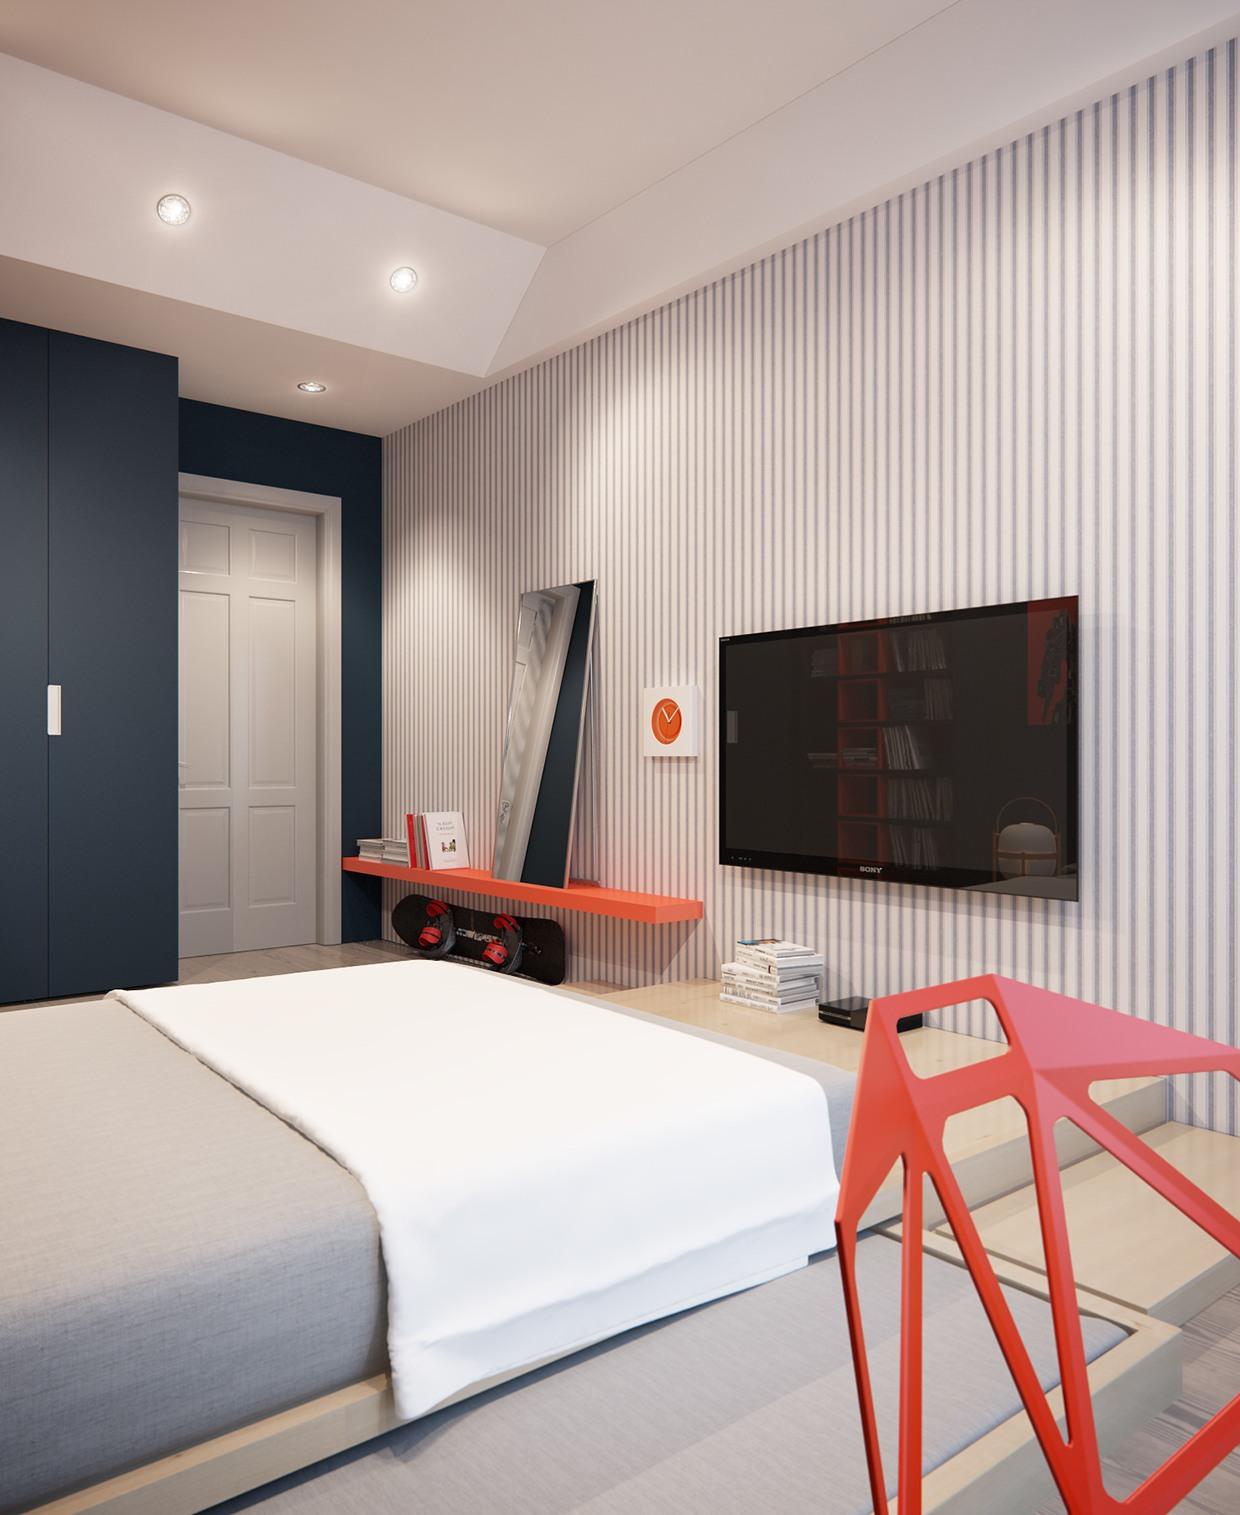 Modern and cool bedroom design